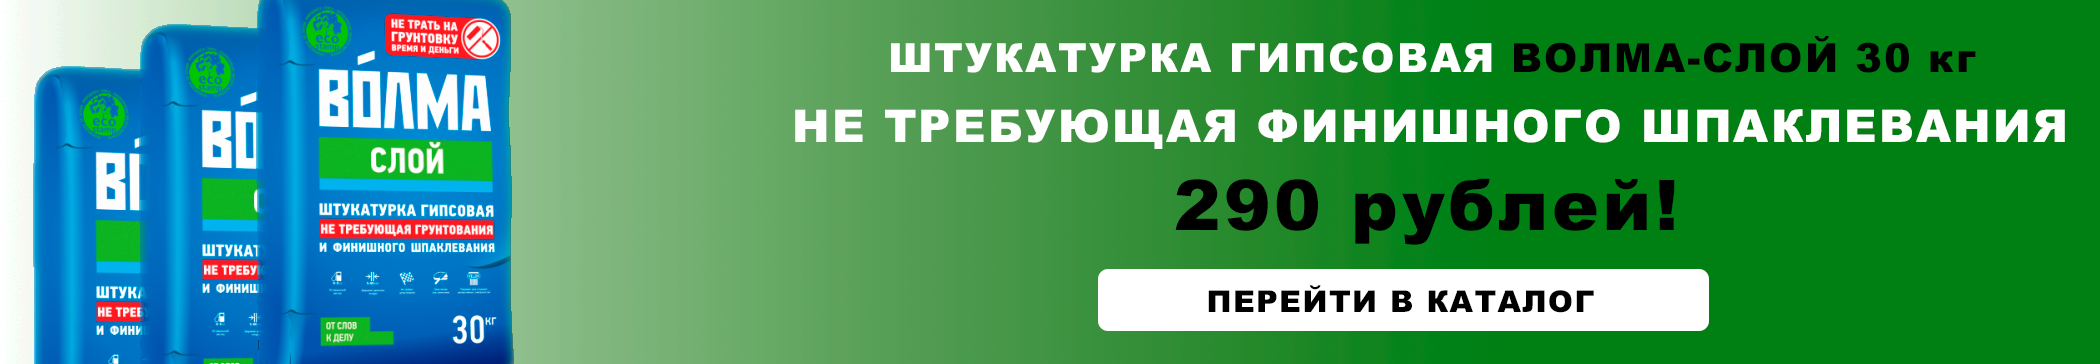 https://st-perm.ru/image/catalog/sales/sales_4.png